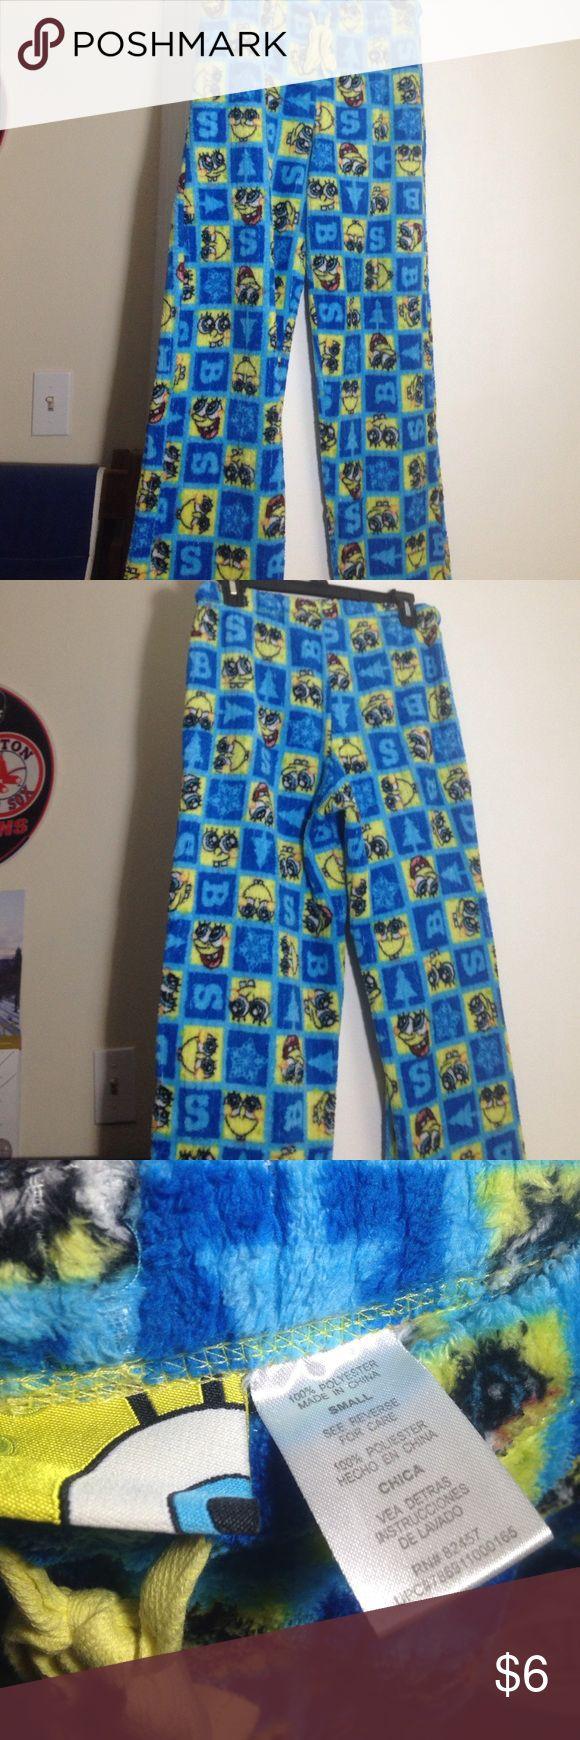 SpongeBob pajama pants, Size Small SpongeBob pajama pants, size small. Gently worn. More for appearance than warmth. Cute for anyone who's a fan! SpongeBob Squarepants Intimates & Sleepwear Pajamas